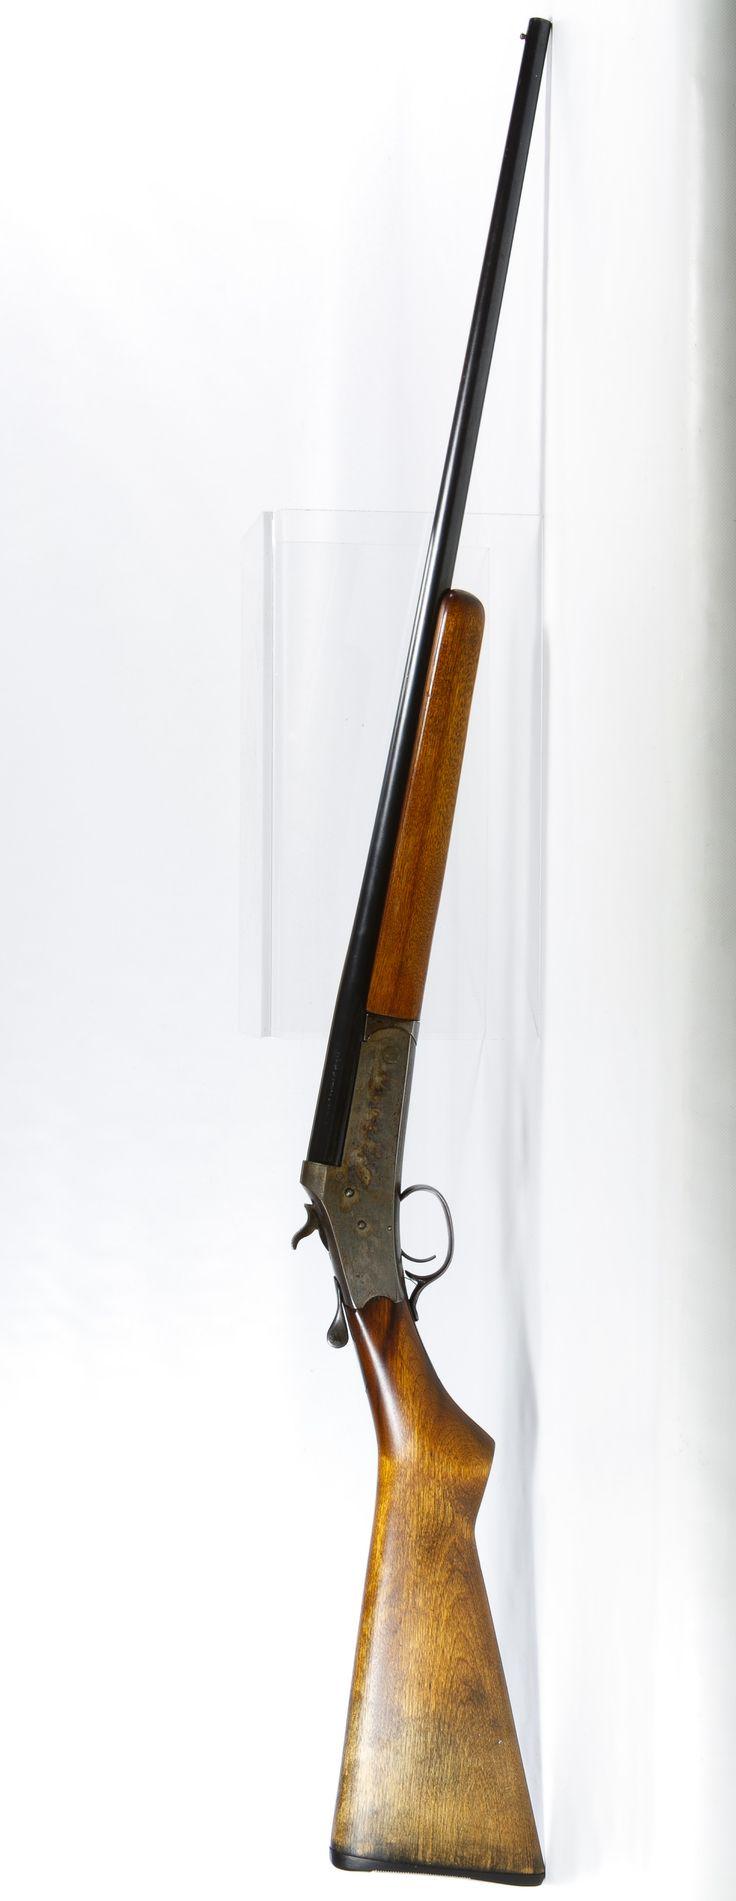 Lot 272: Stevens Springfield 410 Ga. Single Barrel Shotgun; Breach load single shot shotgun